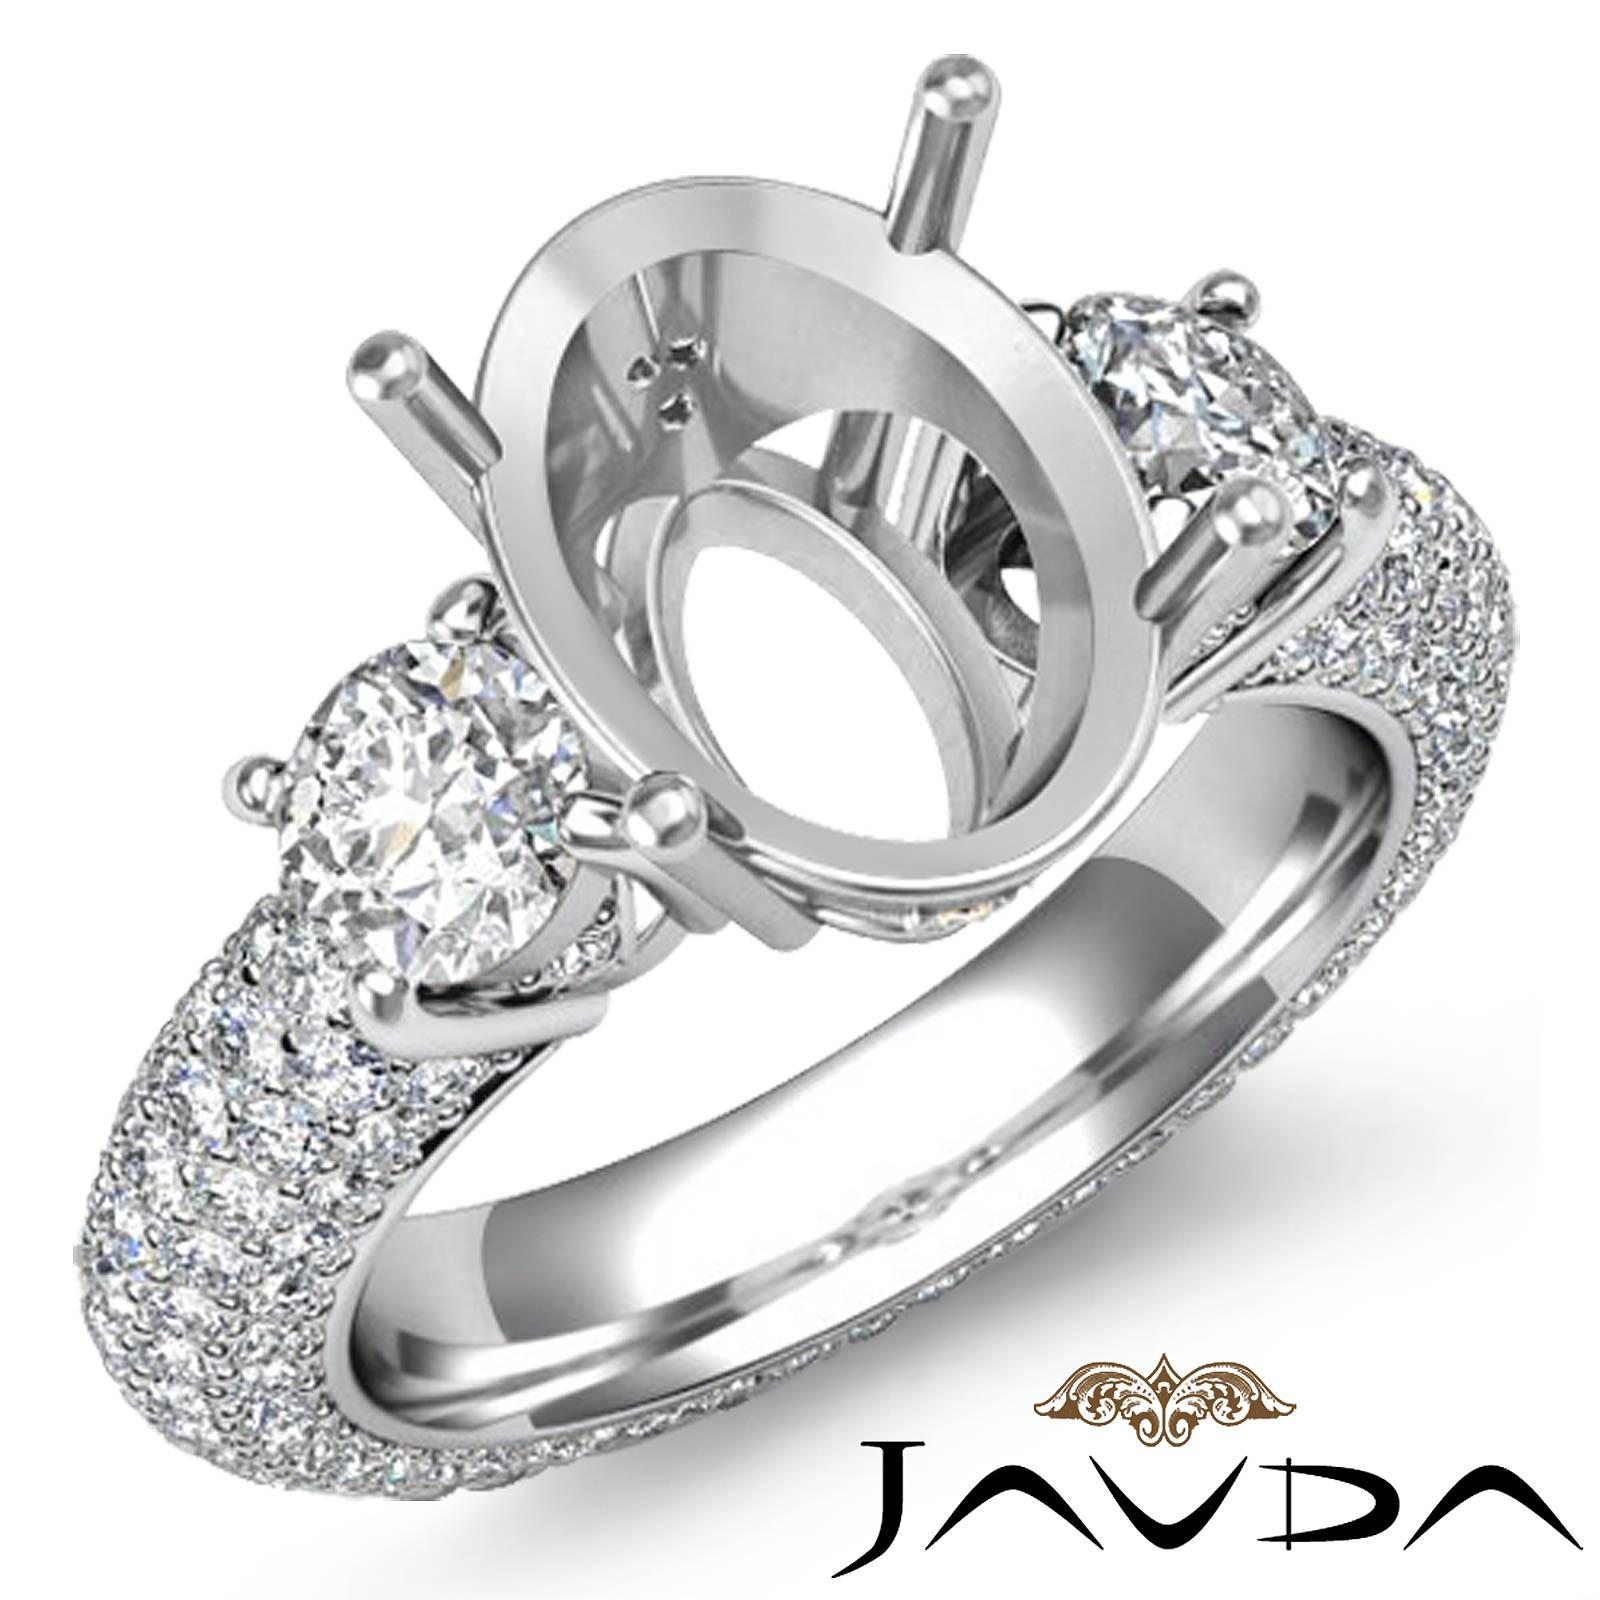 3 stone round diamond engagement ring setting 14k w gold. Black Bedroom Furniture Sets. Home Design Ideas